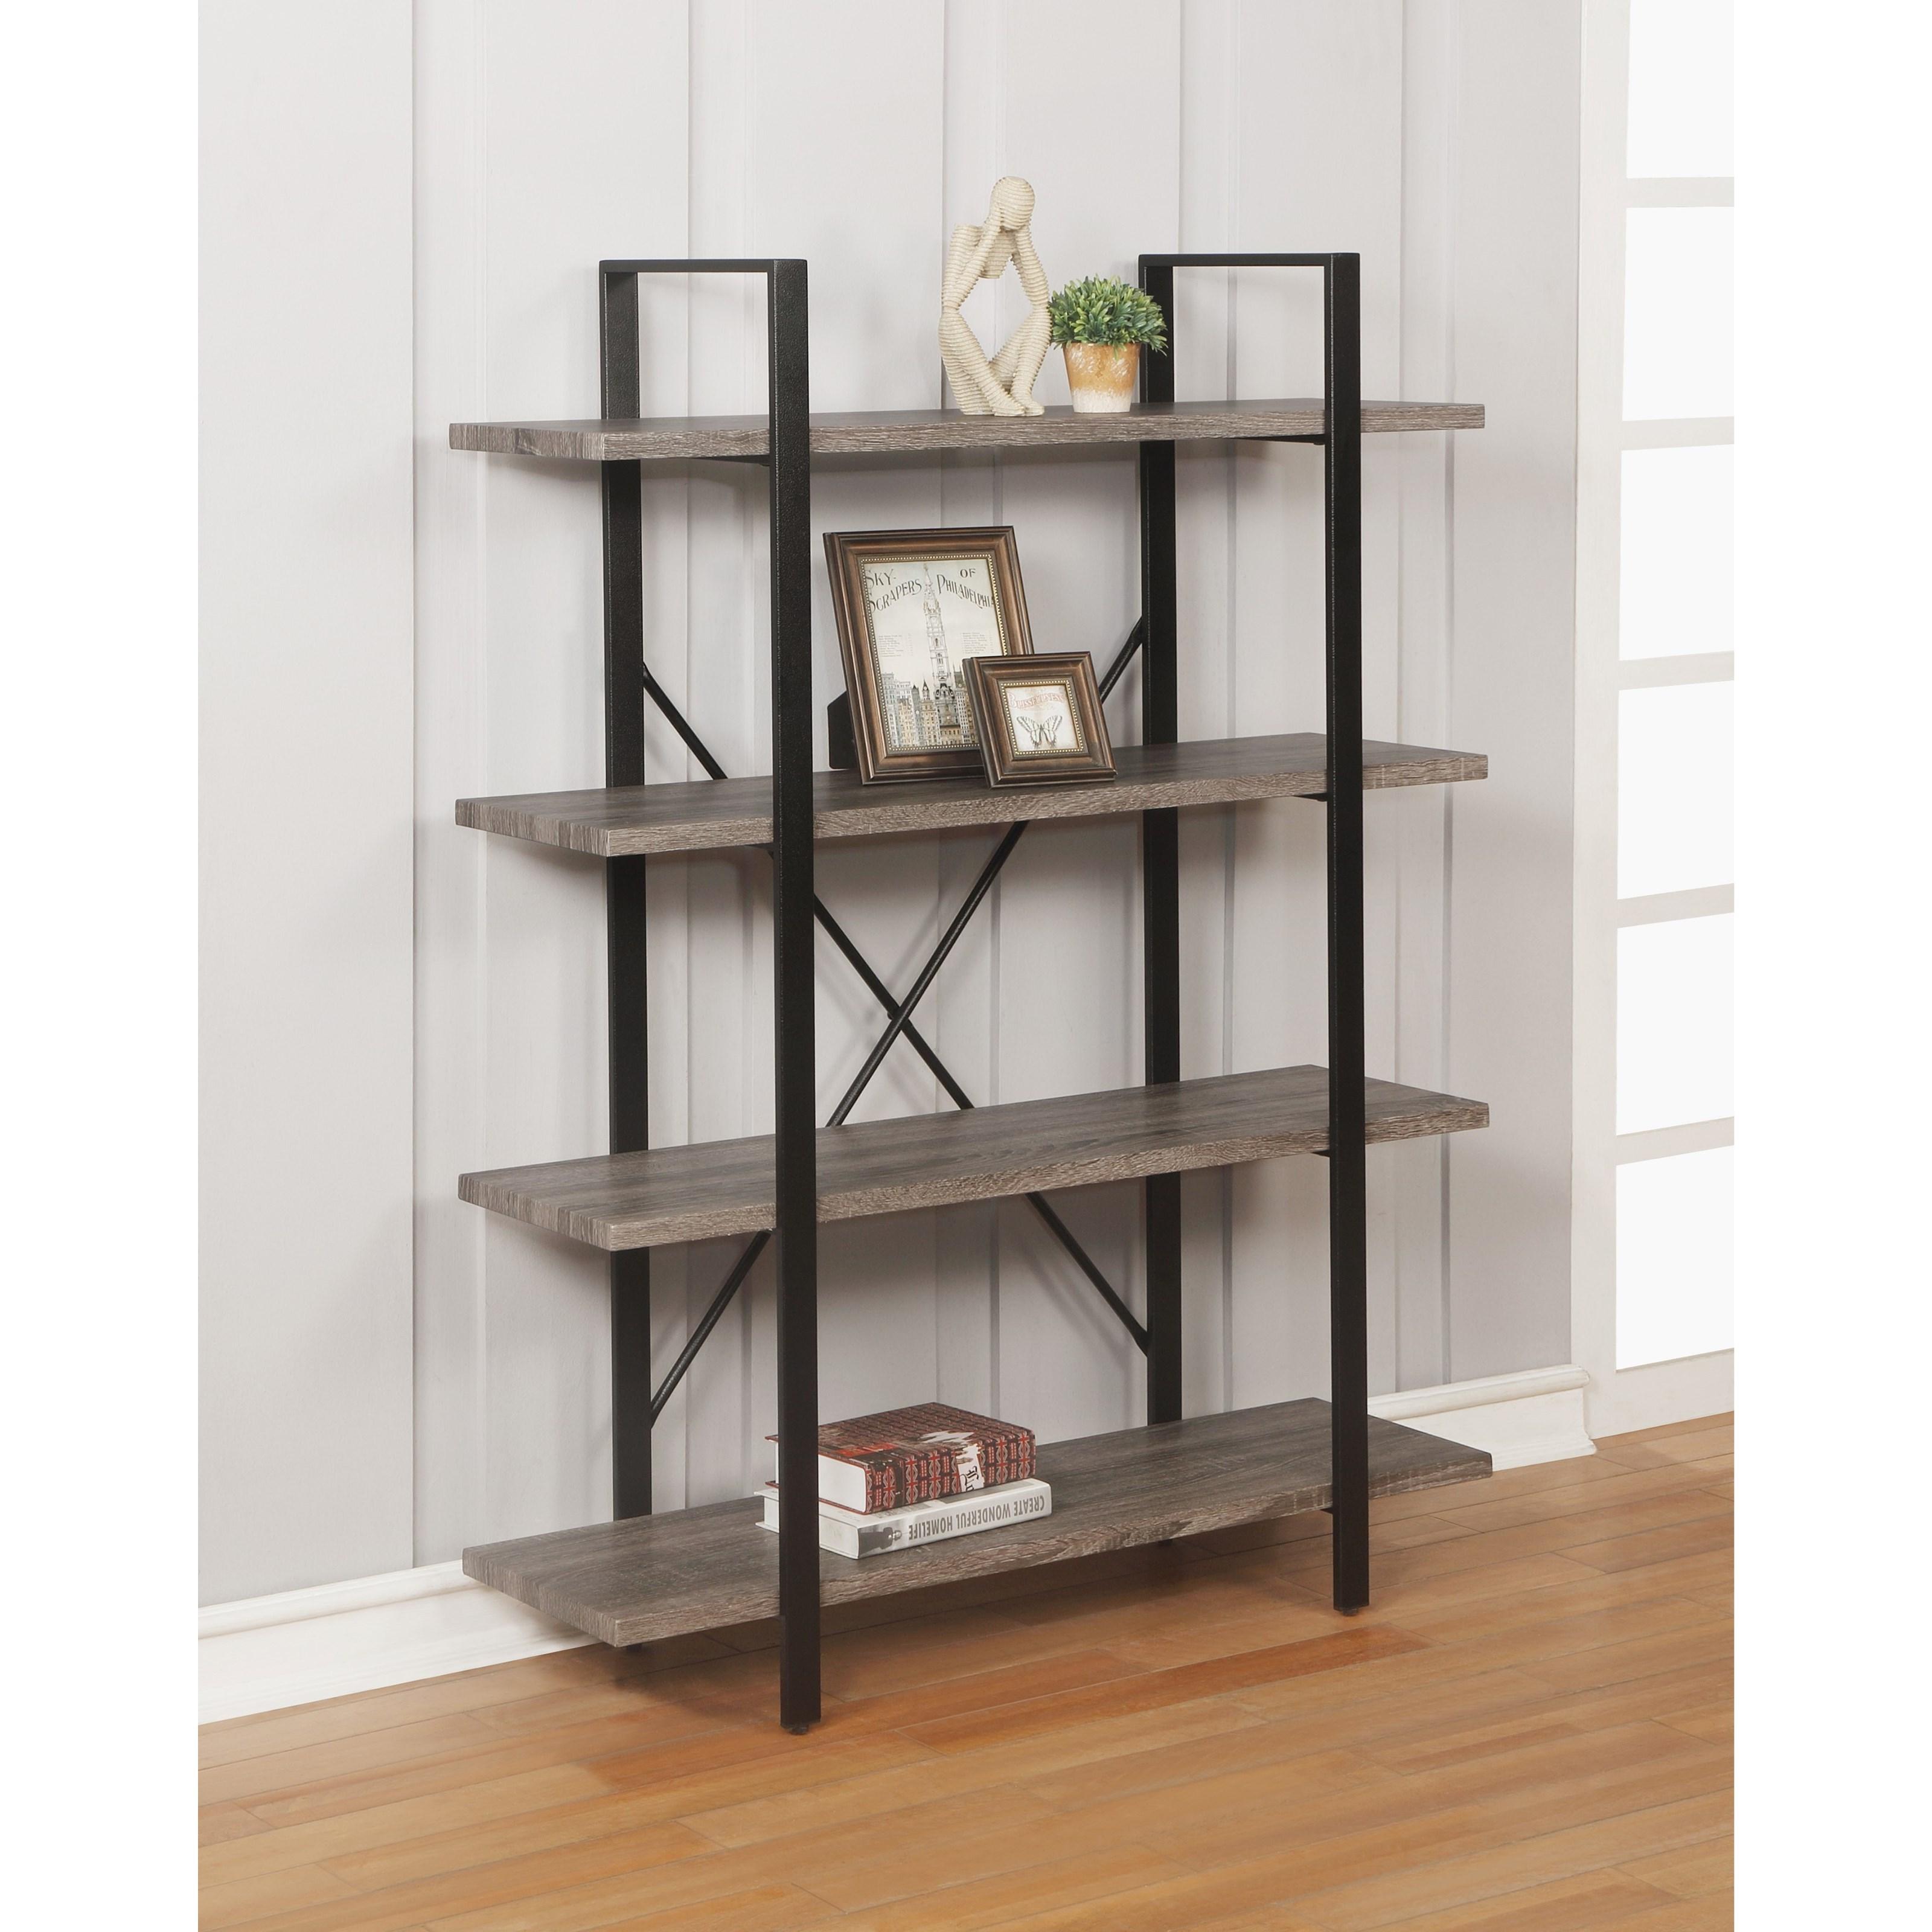 Durango Etagere Bookcase